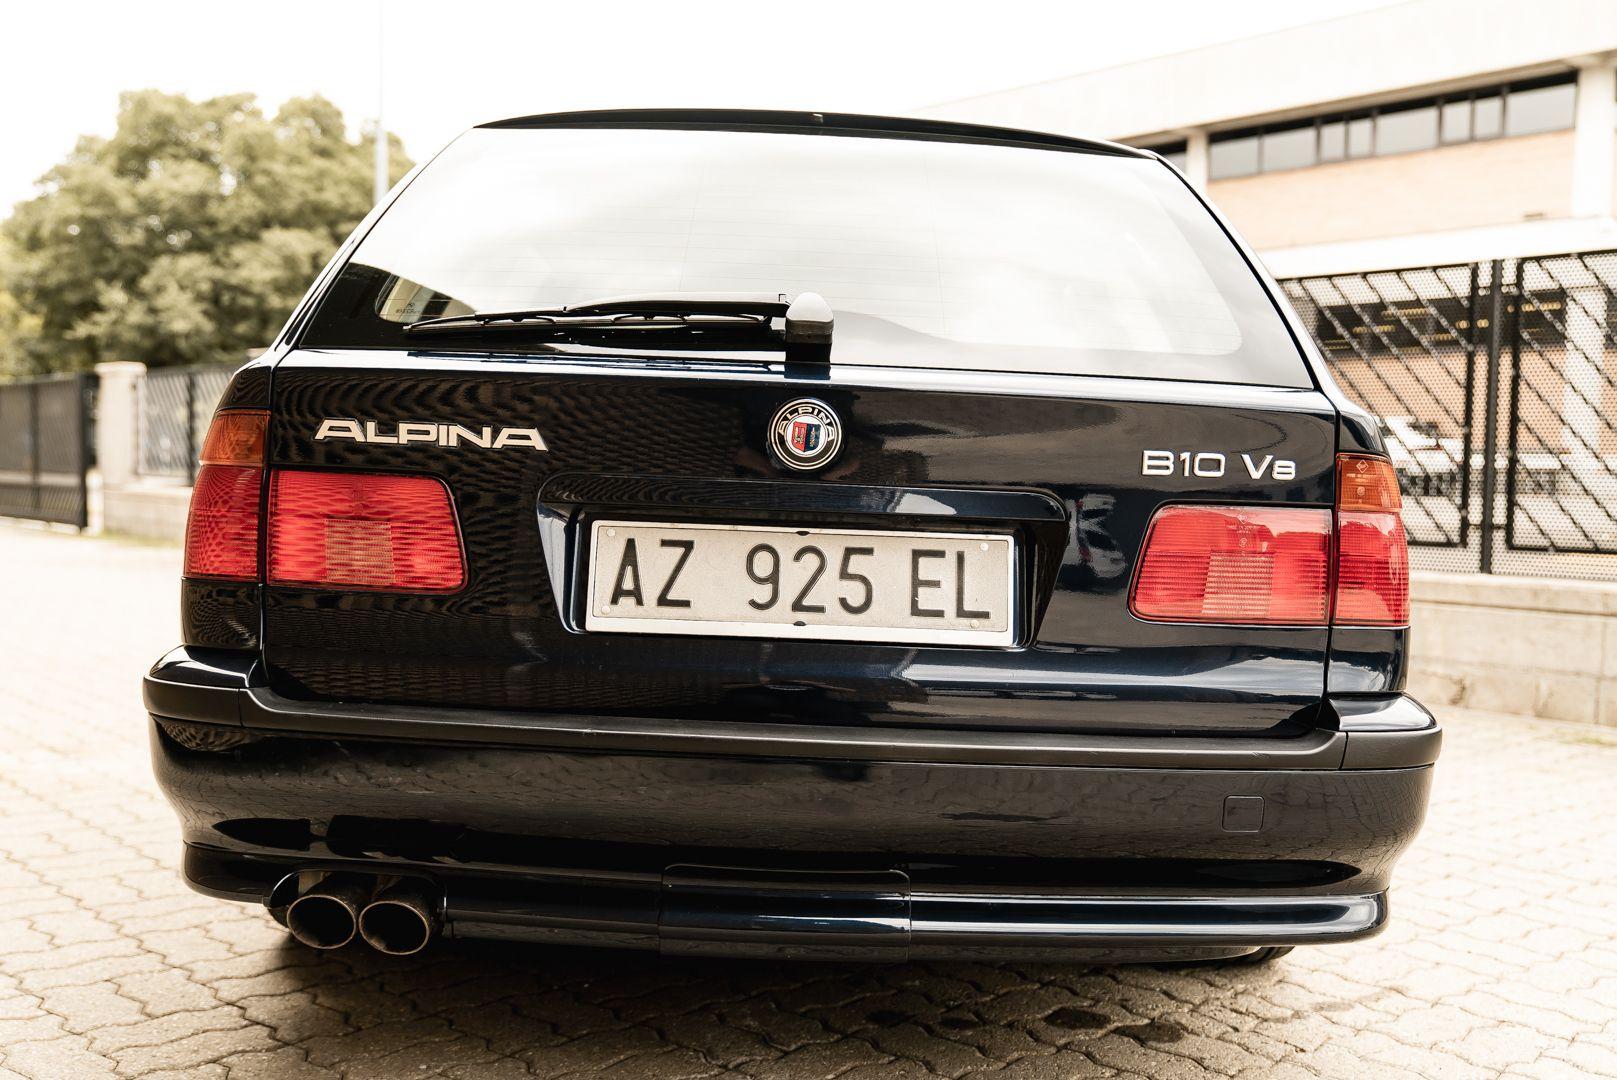 1998 BMW Alpina B10 Touring V8 82/204 78169